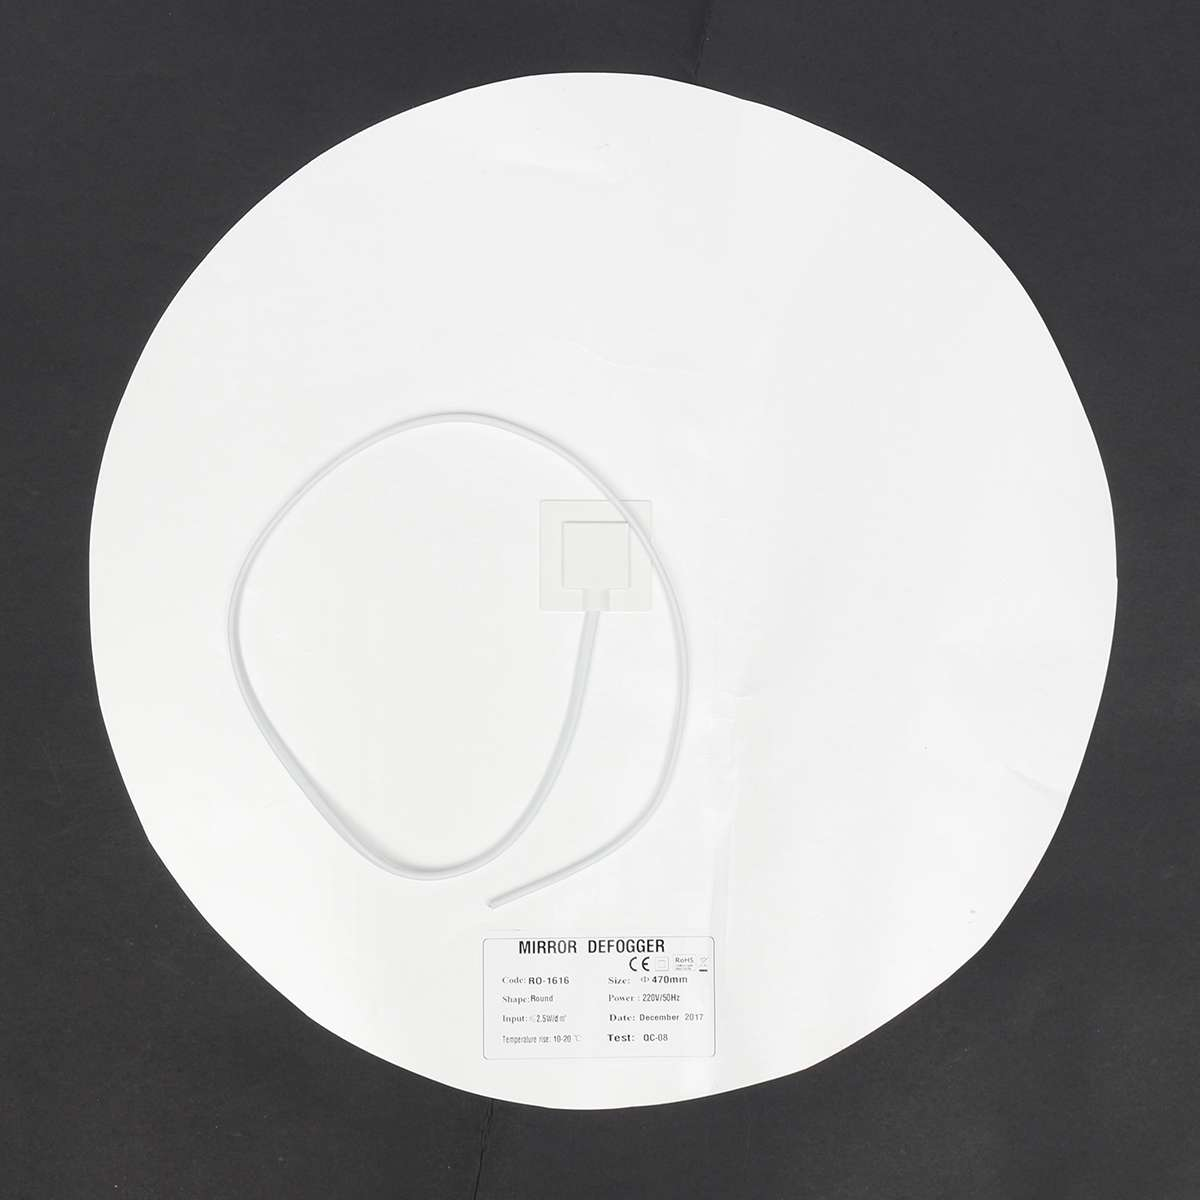 240V Bathroom Mirror Demister Defogger Heating Pad Steam Free 110V 220V